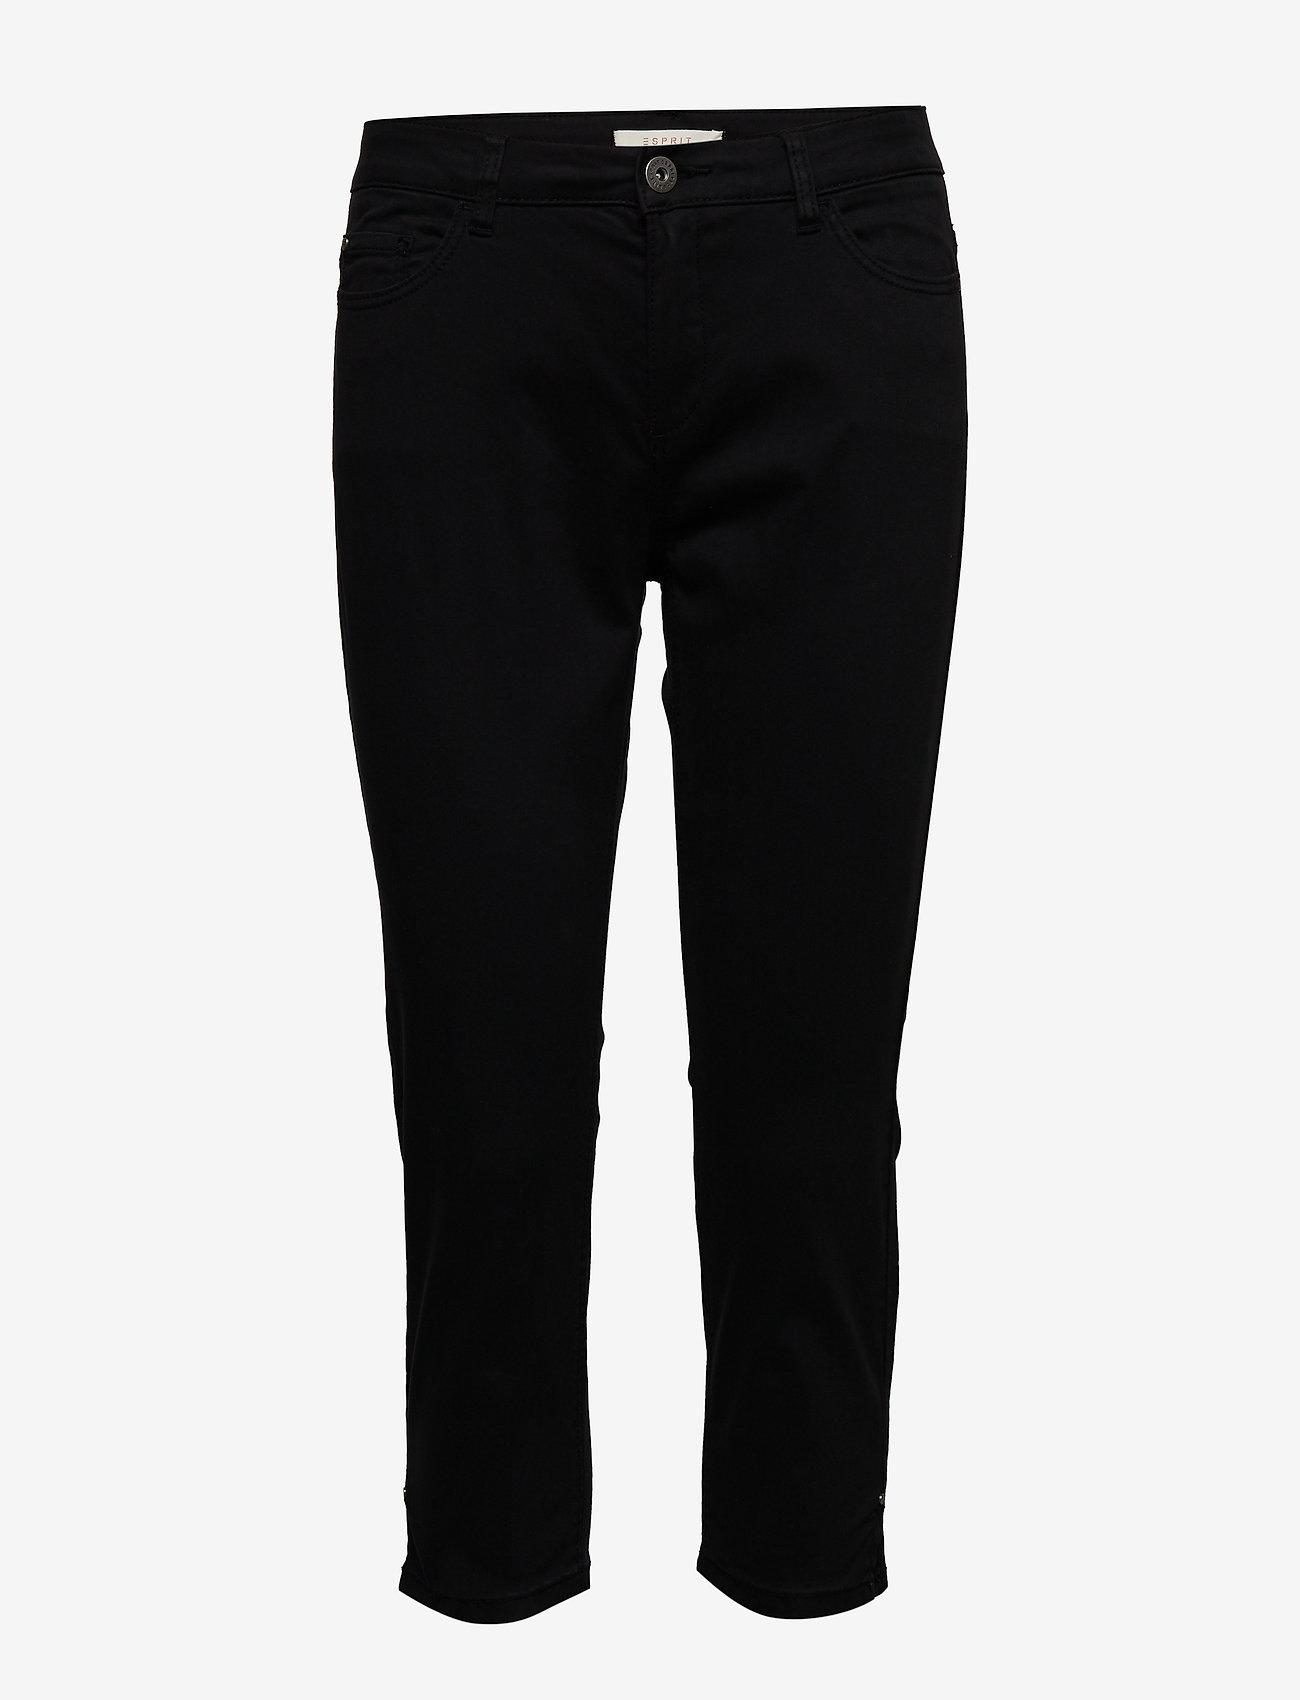 Esprit Casual - Pants woven - casual bukser - black - 0